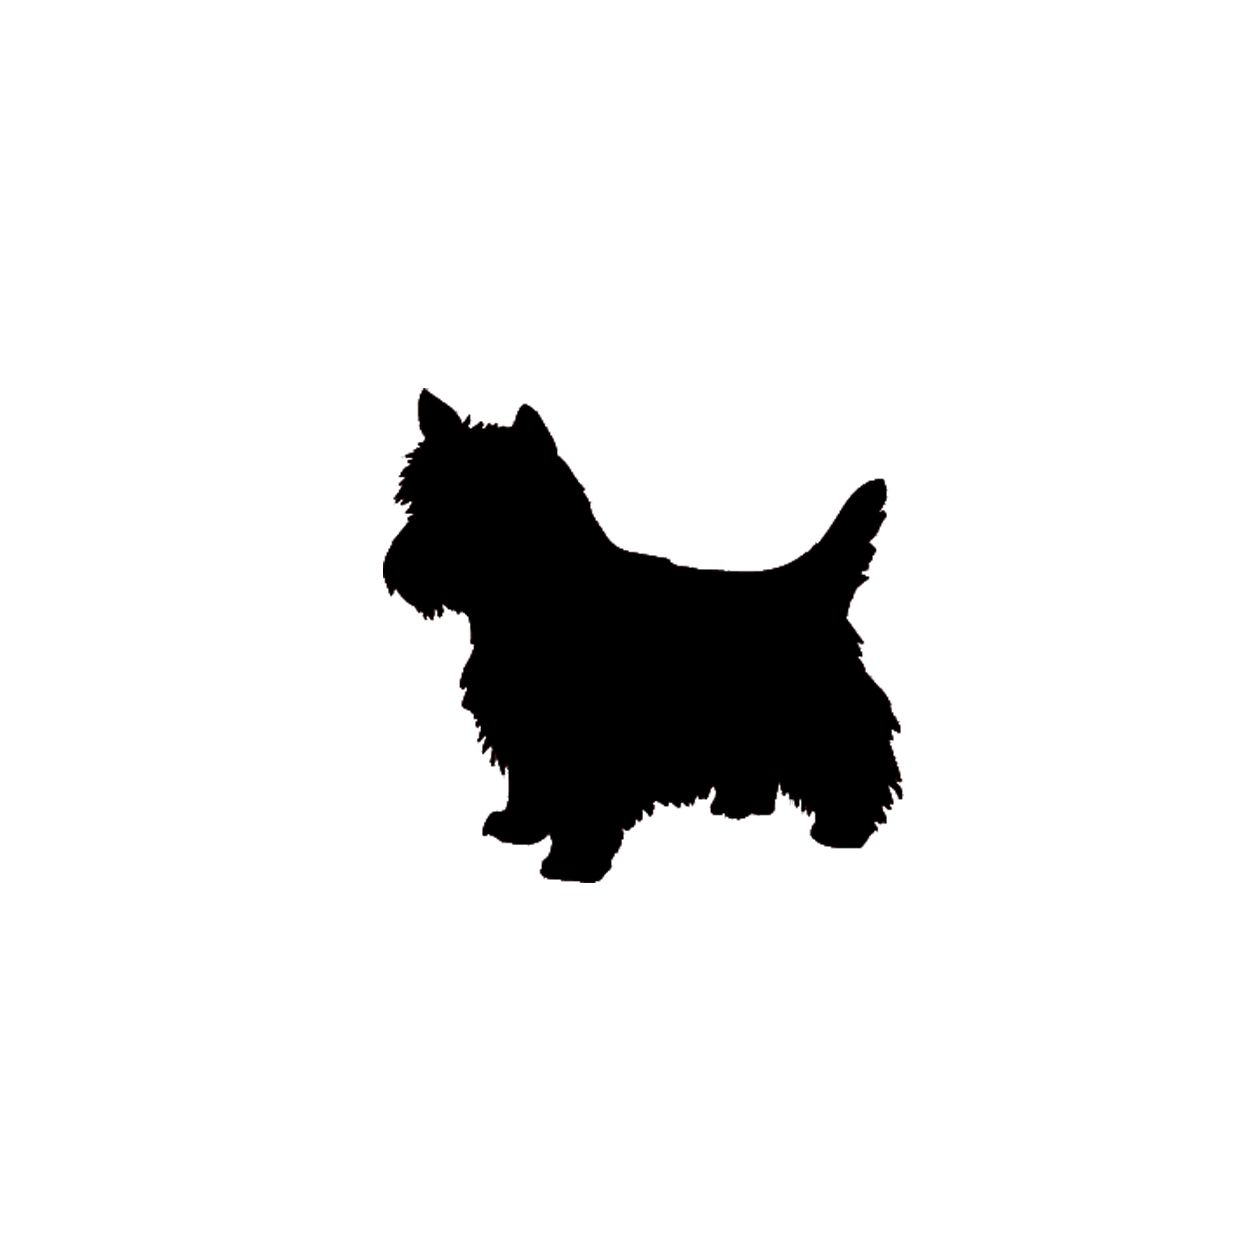 1260x1260 Free Svg File Download Yorkie Dog Silhouette Beaoriginal